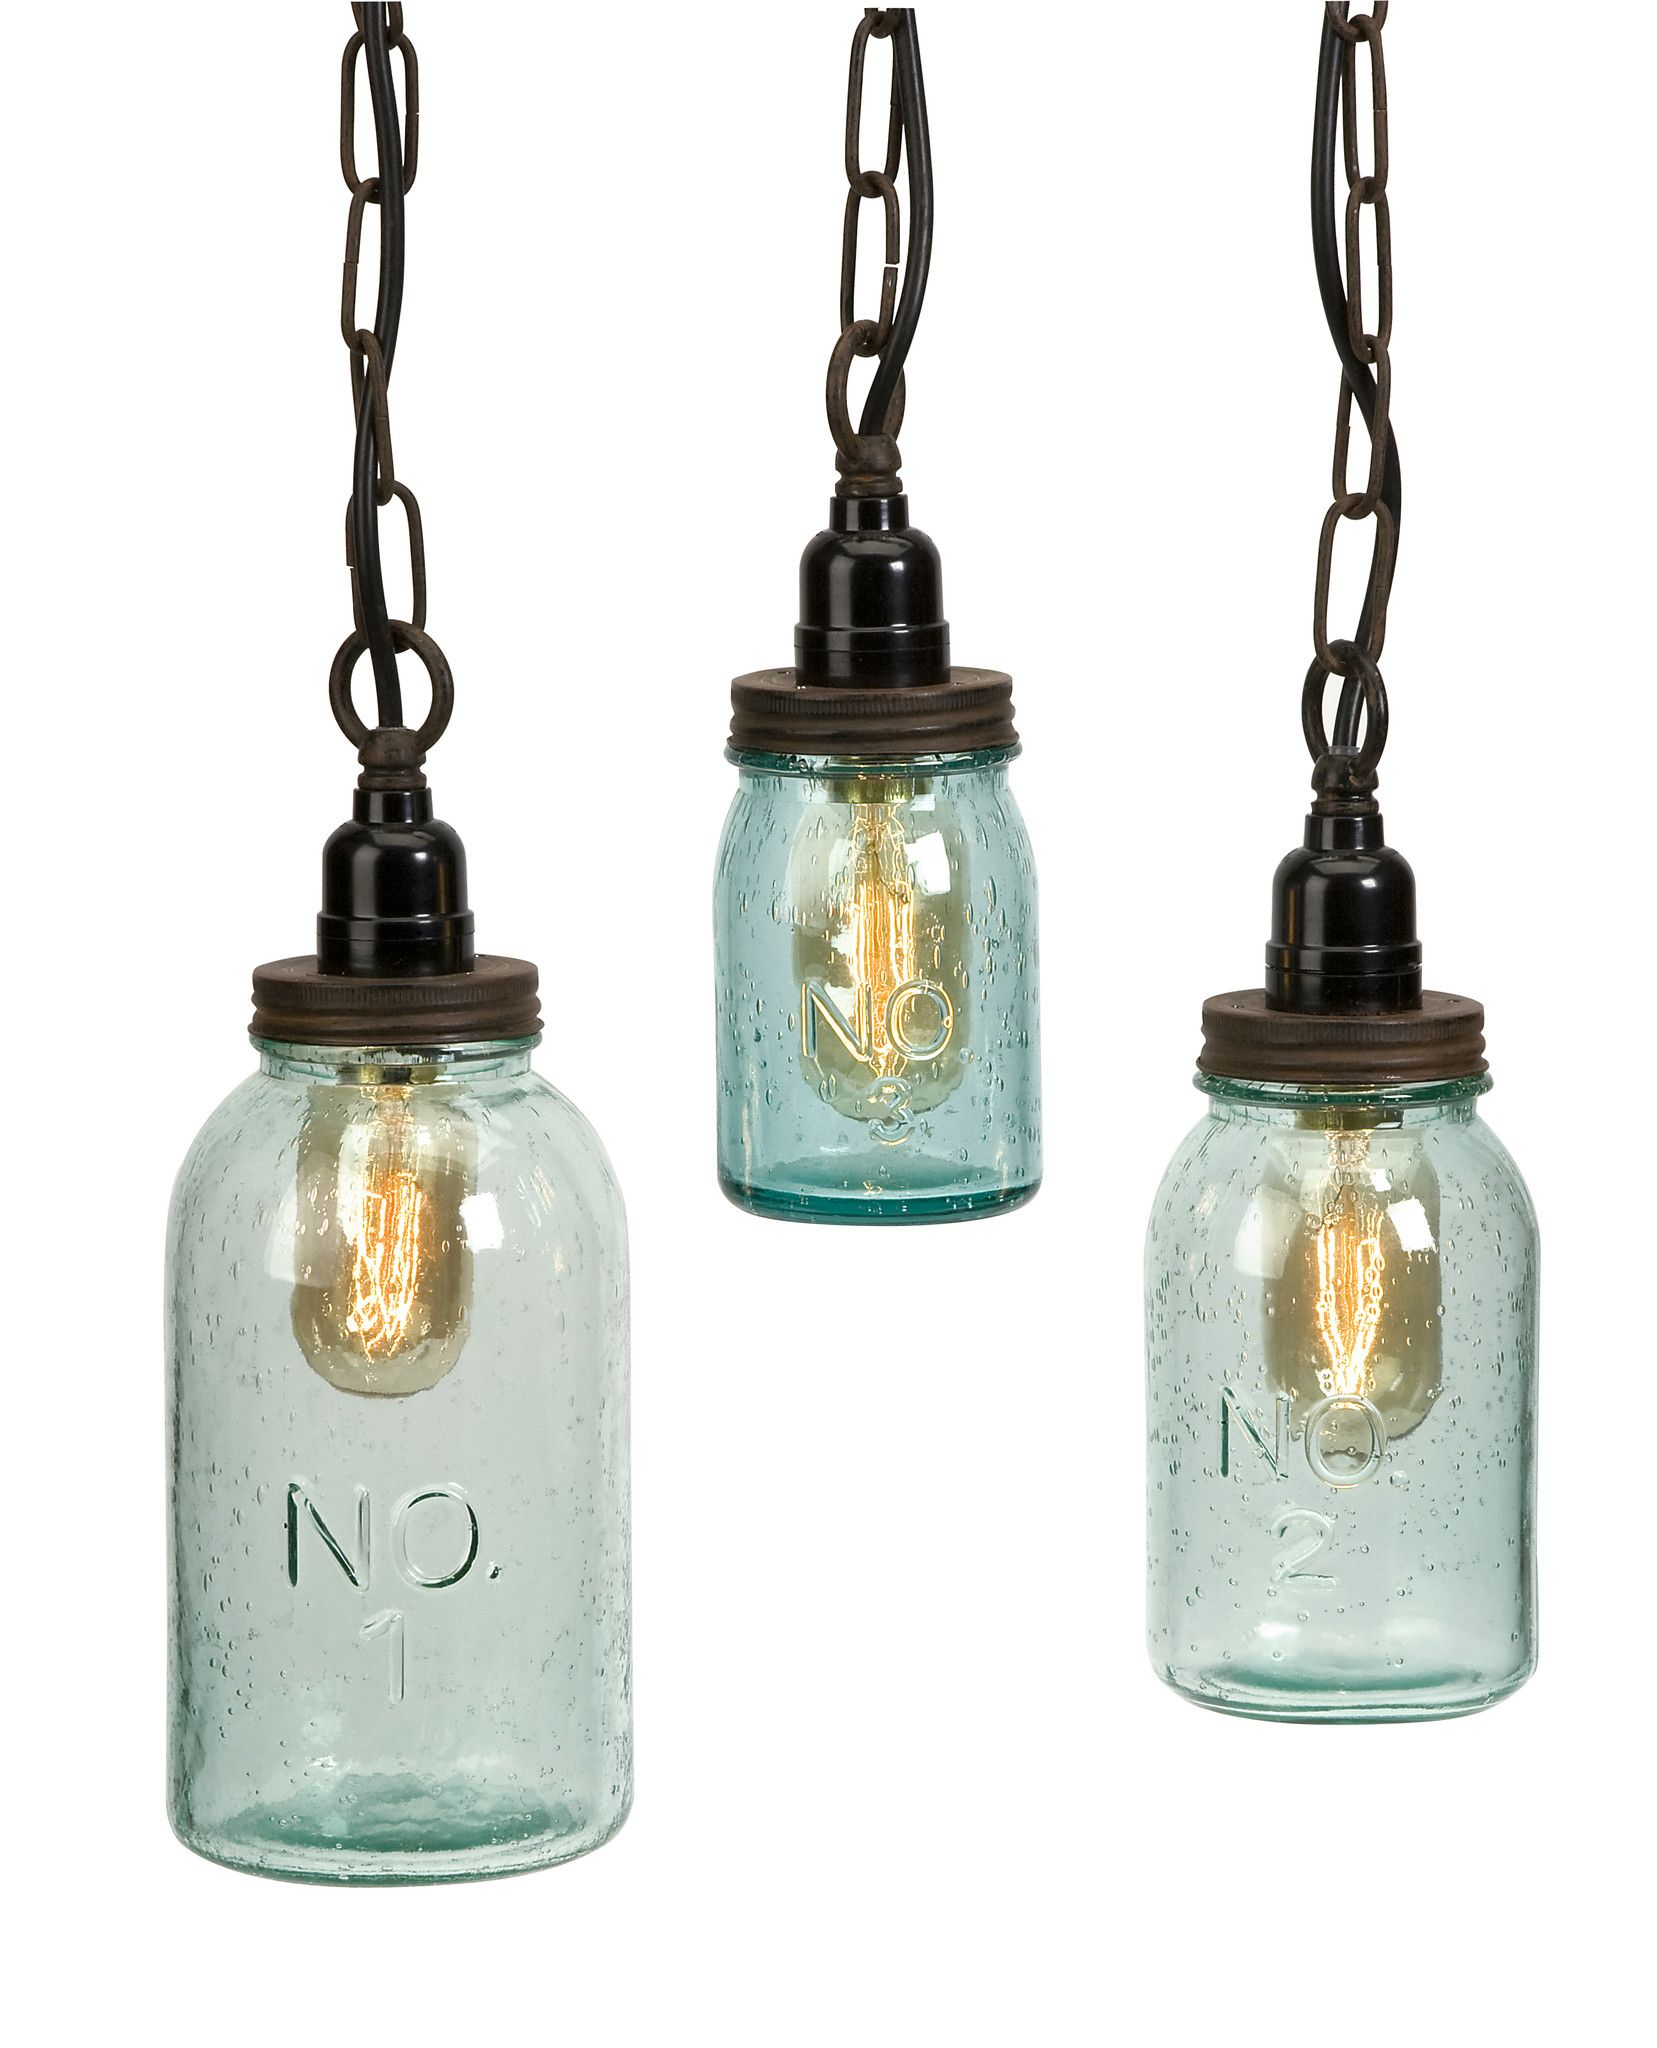 Rustic Industrial Lighting Chandelier Mason Jar Chandelier: Rustic Industrial Mason Jar Pendant Lights